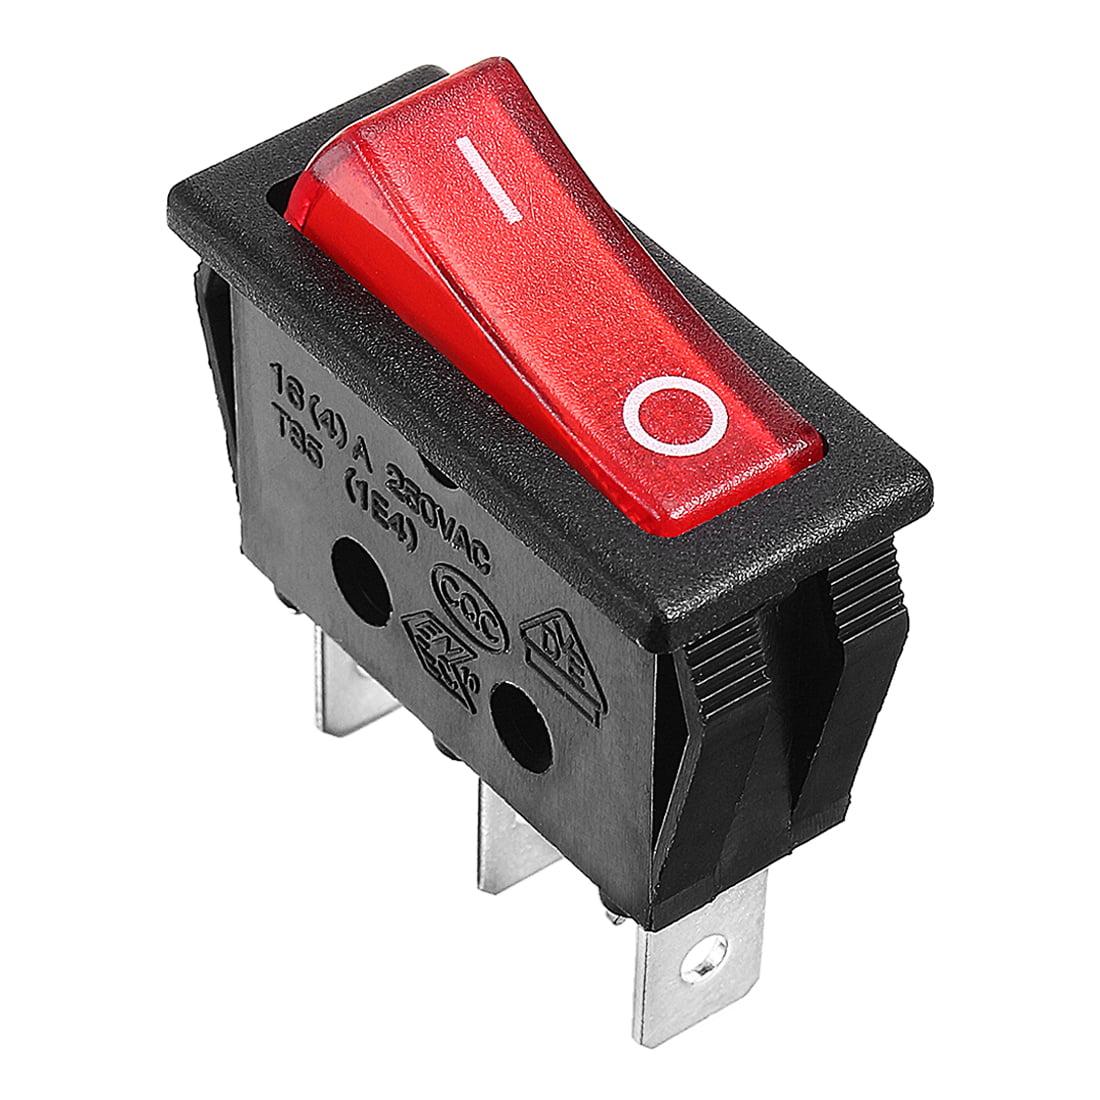 3 Pcs Red Press Button SPST 3 Terminals Boat Rocker Switch 16A 250VAC - image 4 de 7